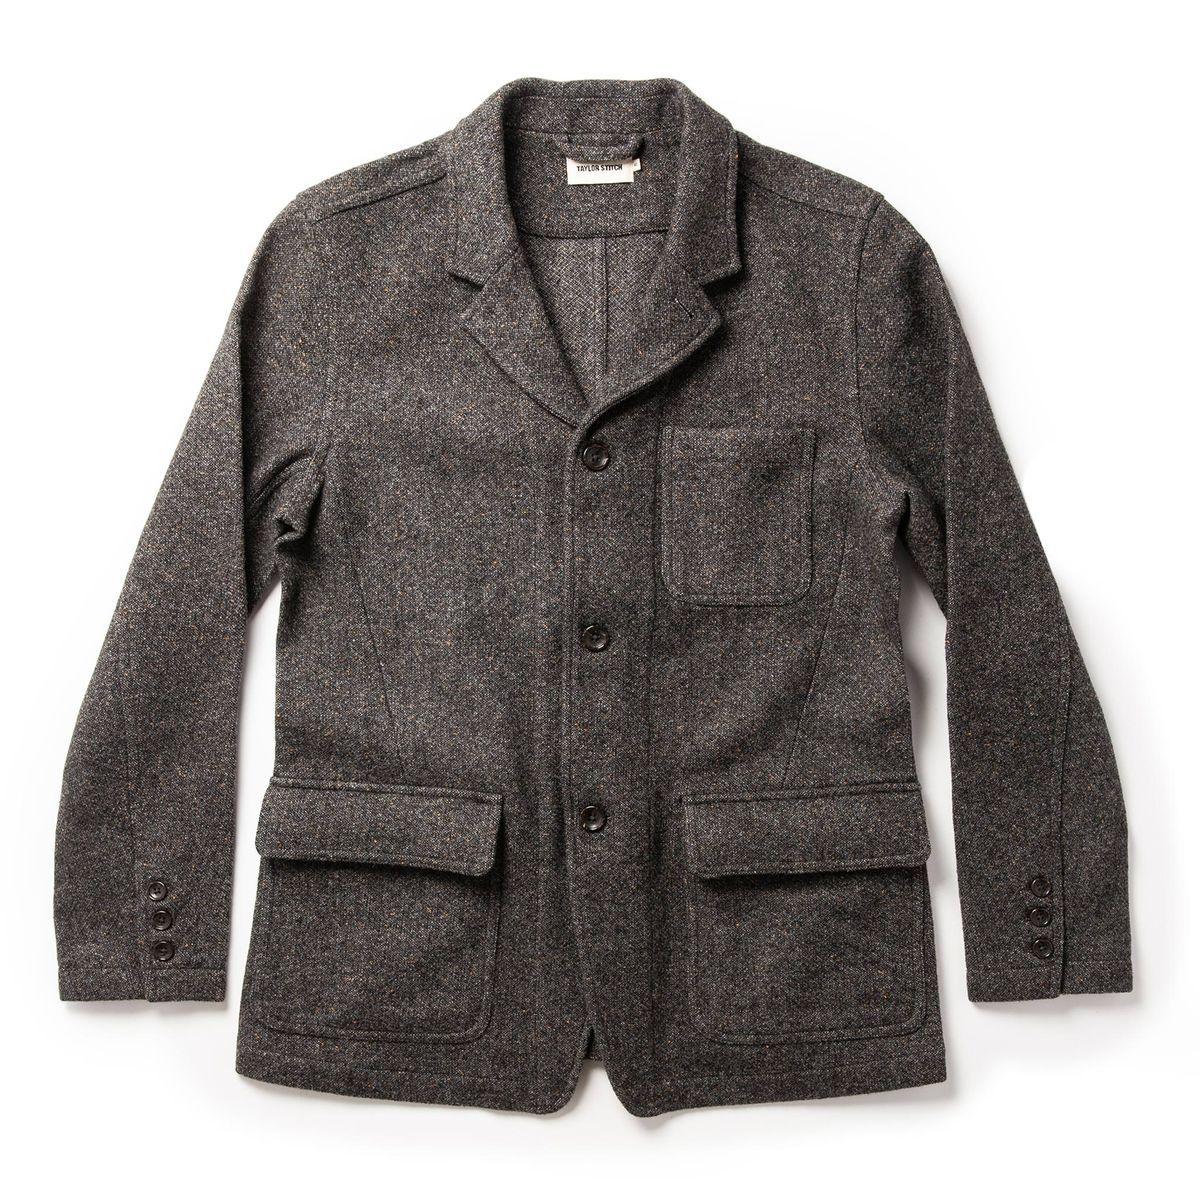 The Gibson Jacket In Charcoal Birdseye Wool Outerwear Taylor Stitch Jackets [ 1200 x 1200 Pixel ]